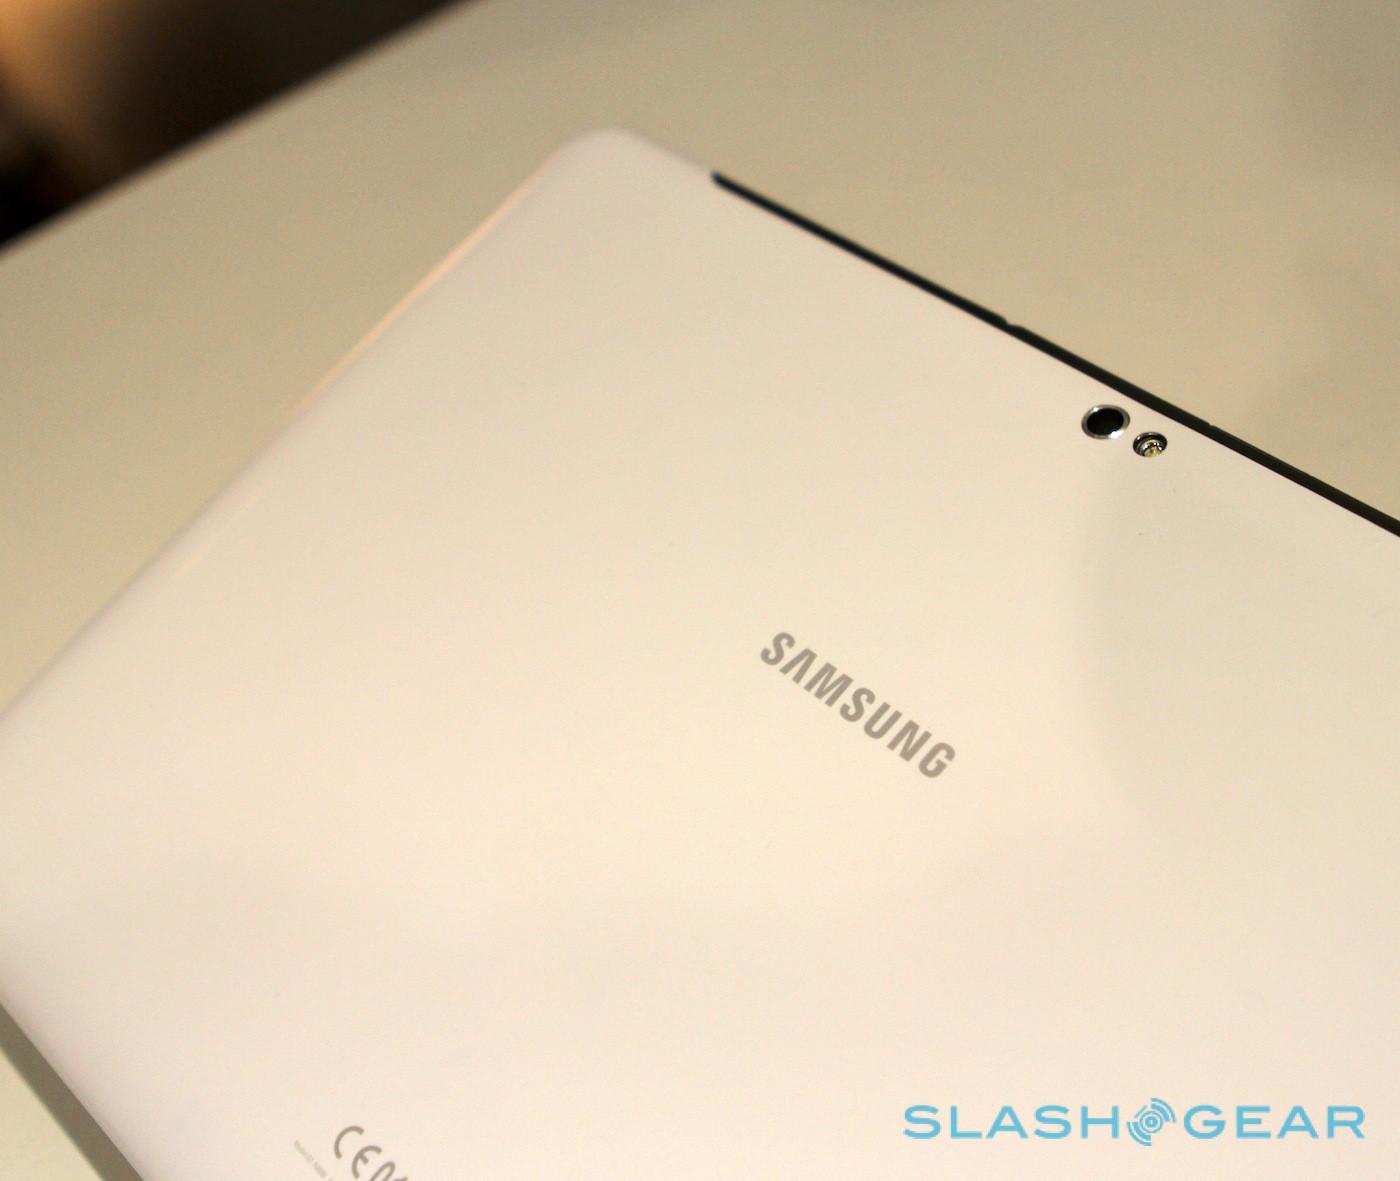 Samsung Galaxy Note 10.1 анонсирован официально: как Galaxy Tab 2 10.1, только со стилусом